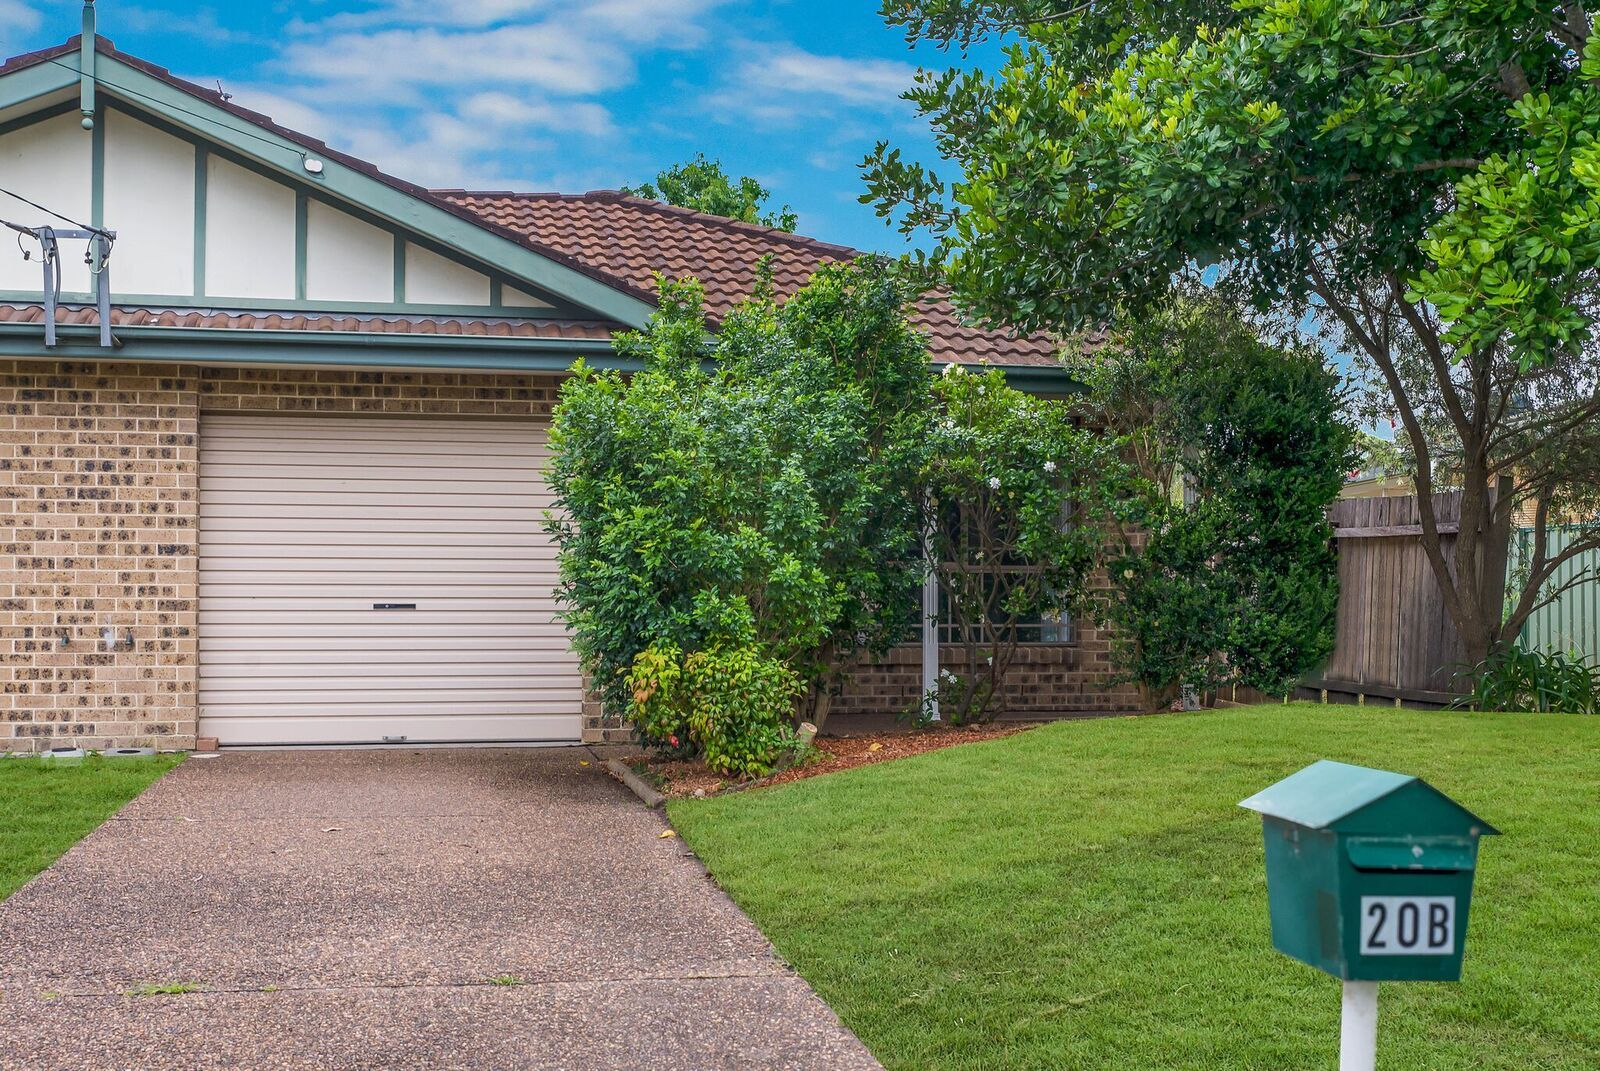 20B Coraki Close, Ourimbah NSW 2258, Image 0